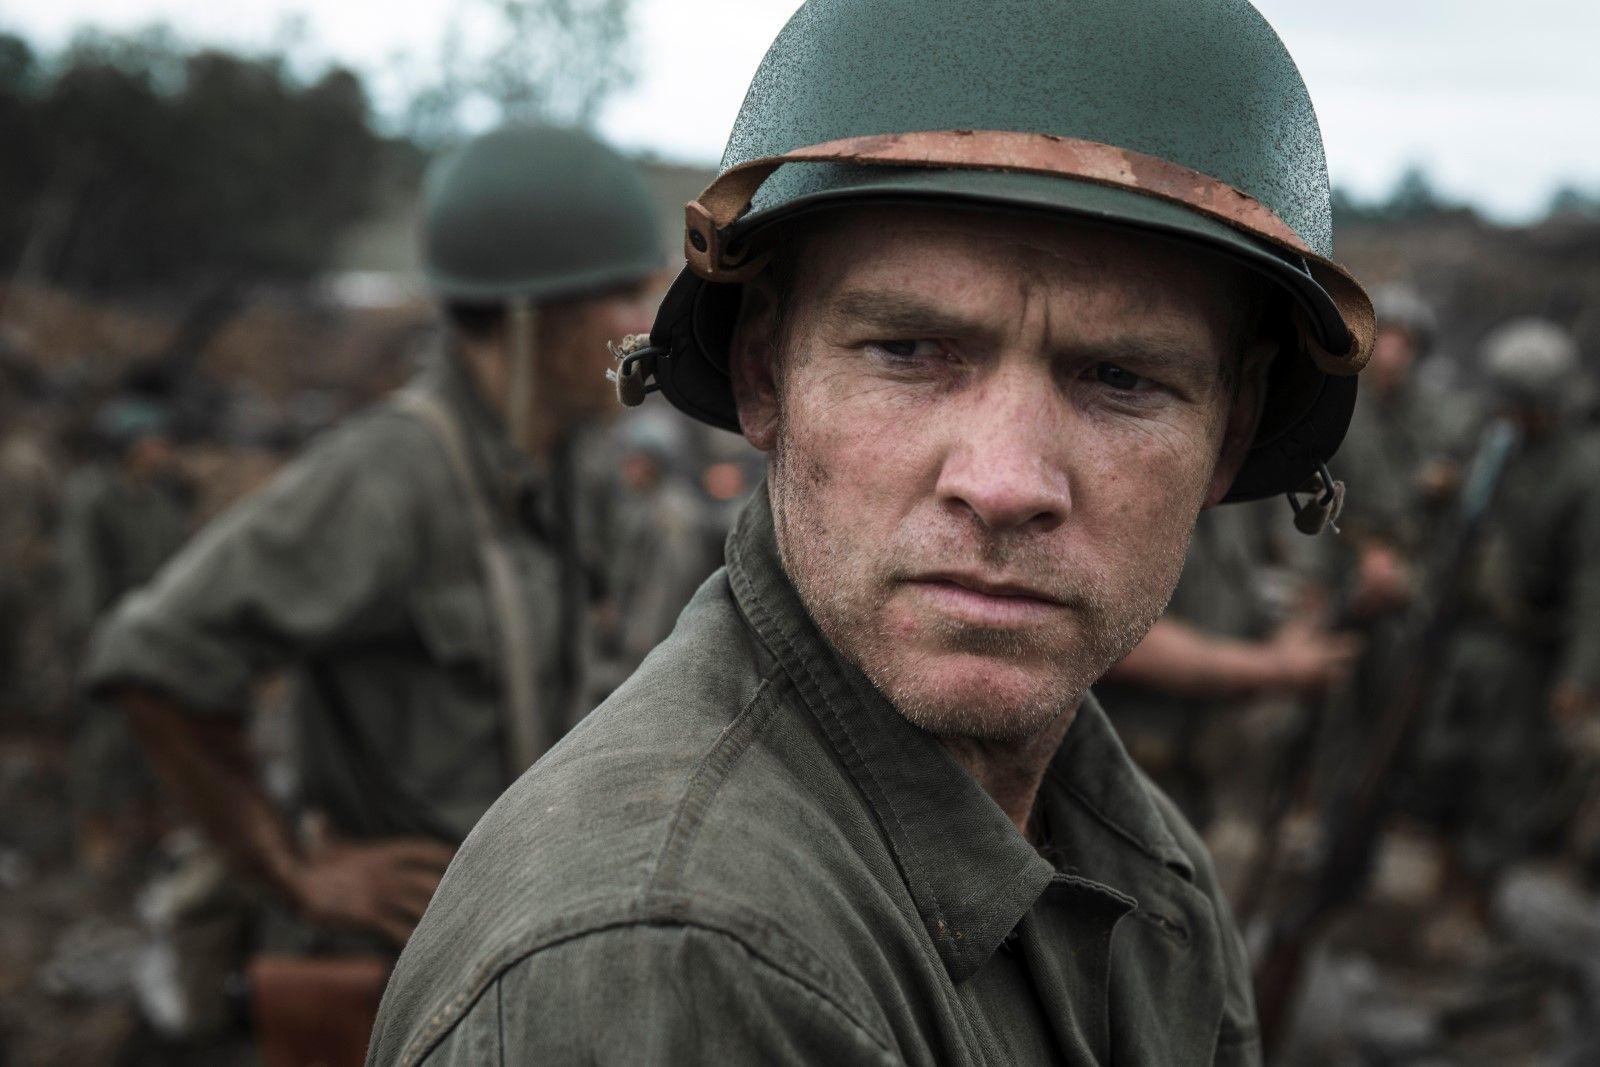 Tu Ne Tueras Point De Mel Gibson 2016 Hacksaw Ridge Sam Worthington Hollywood Actor